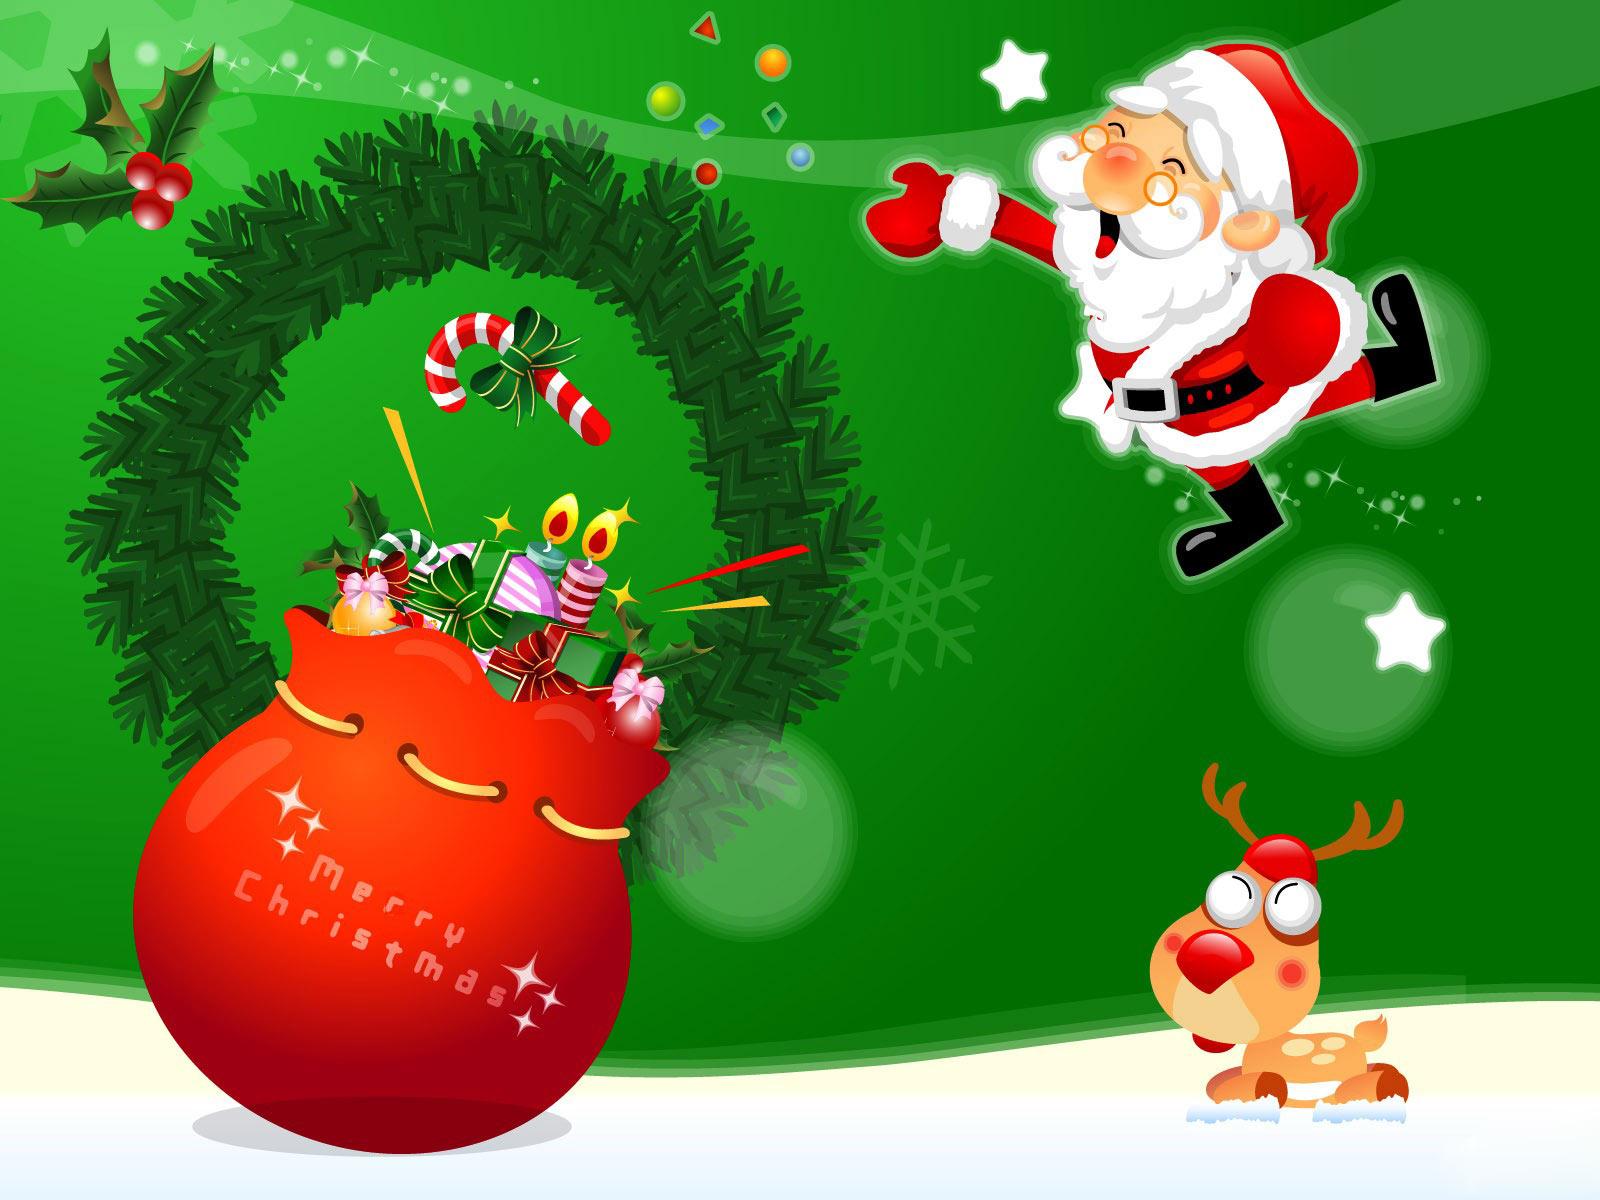 disney world christmas wallpapers, walt disney world | wallpapers